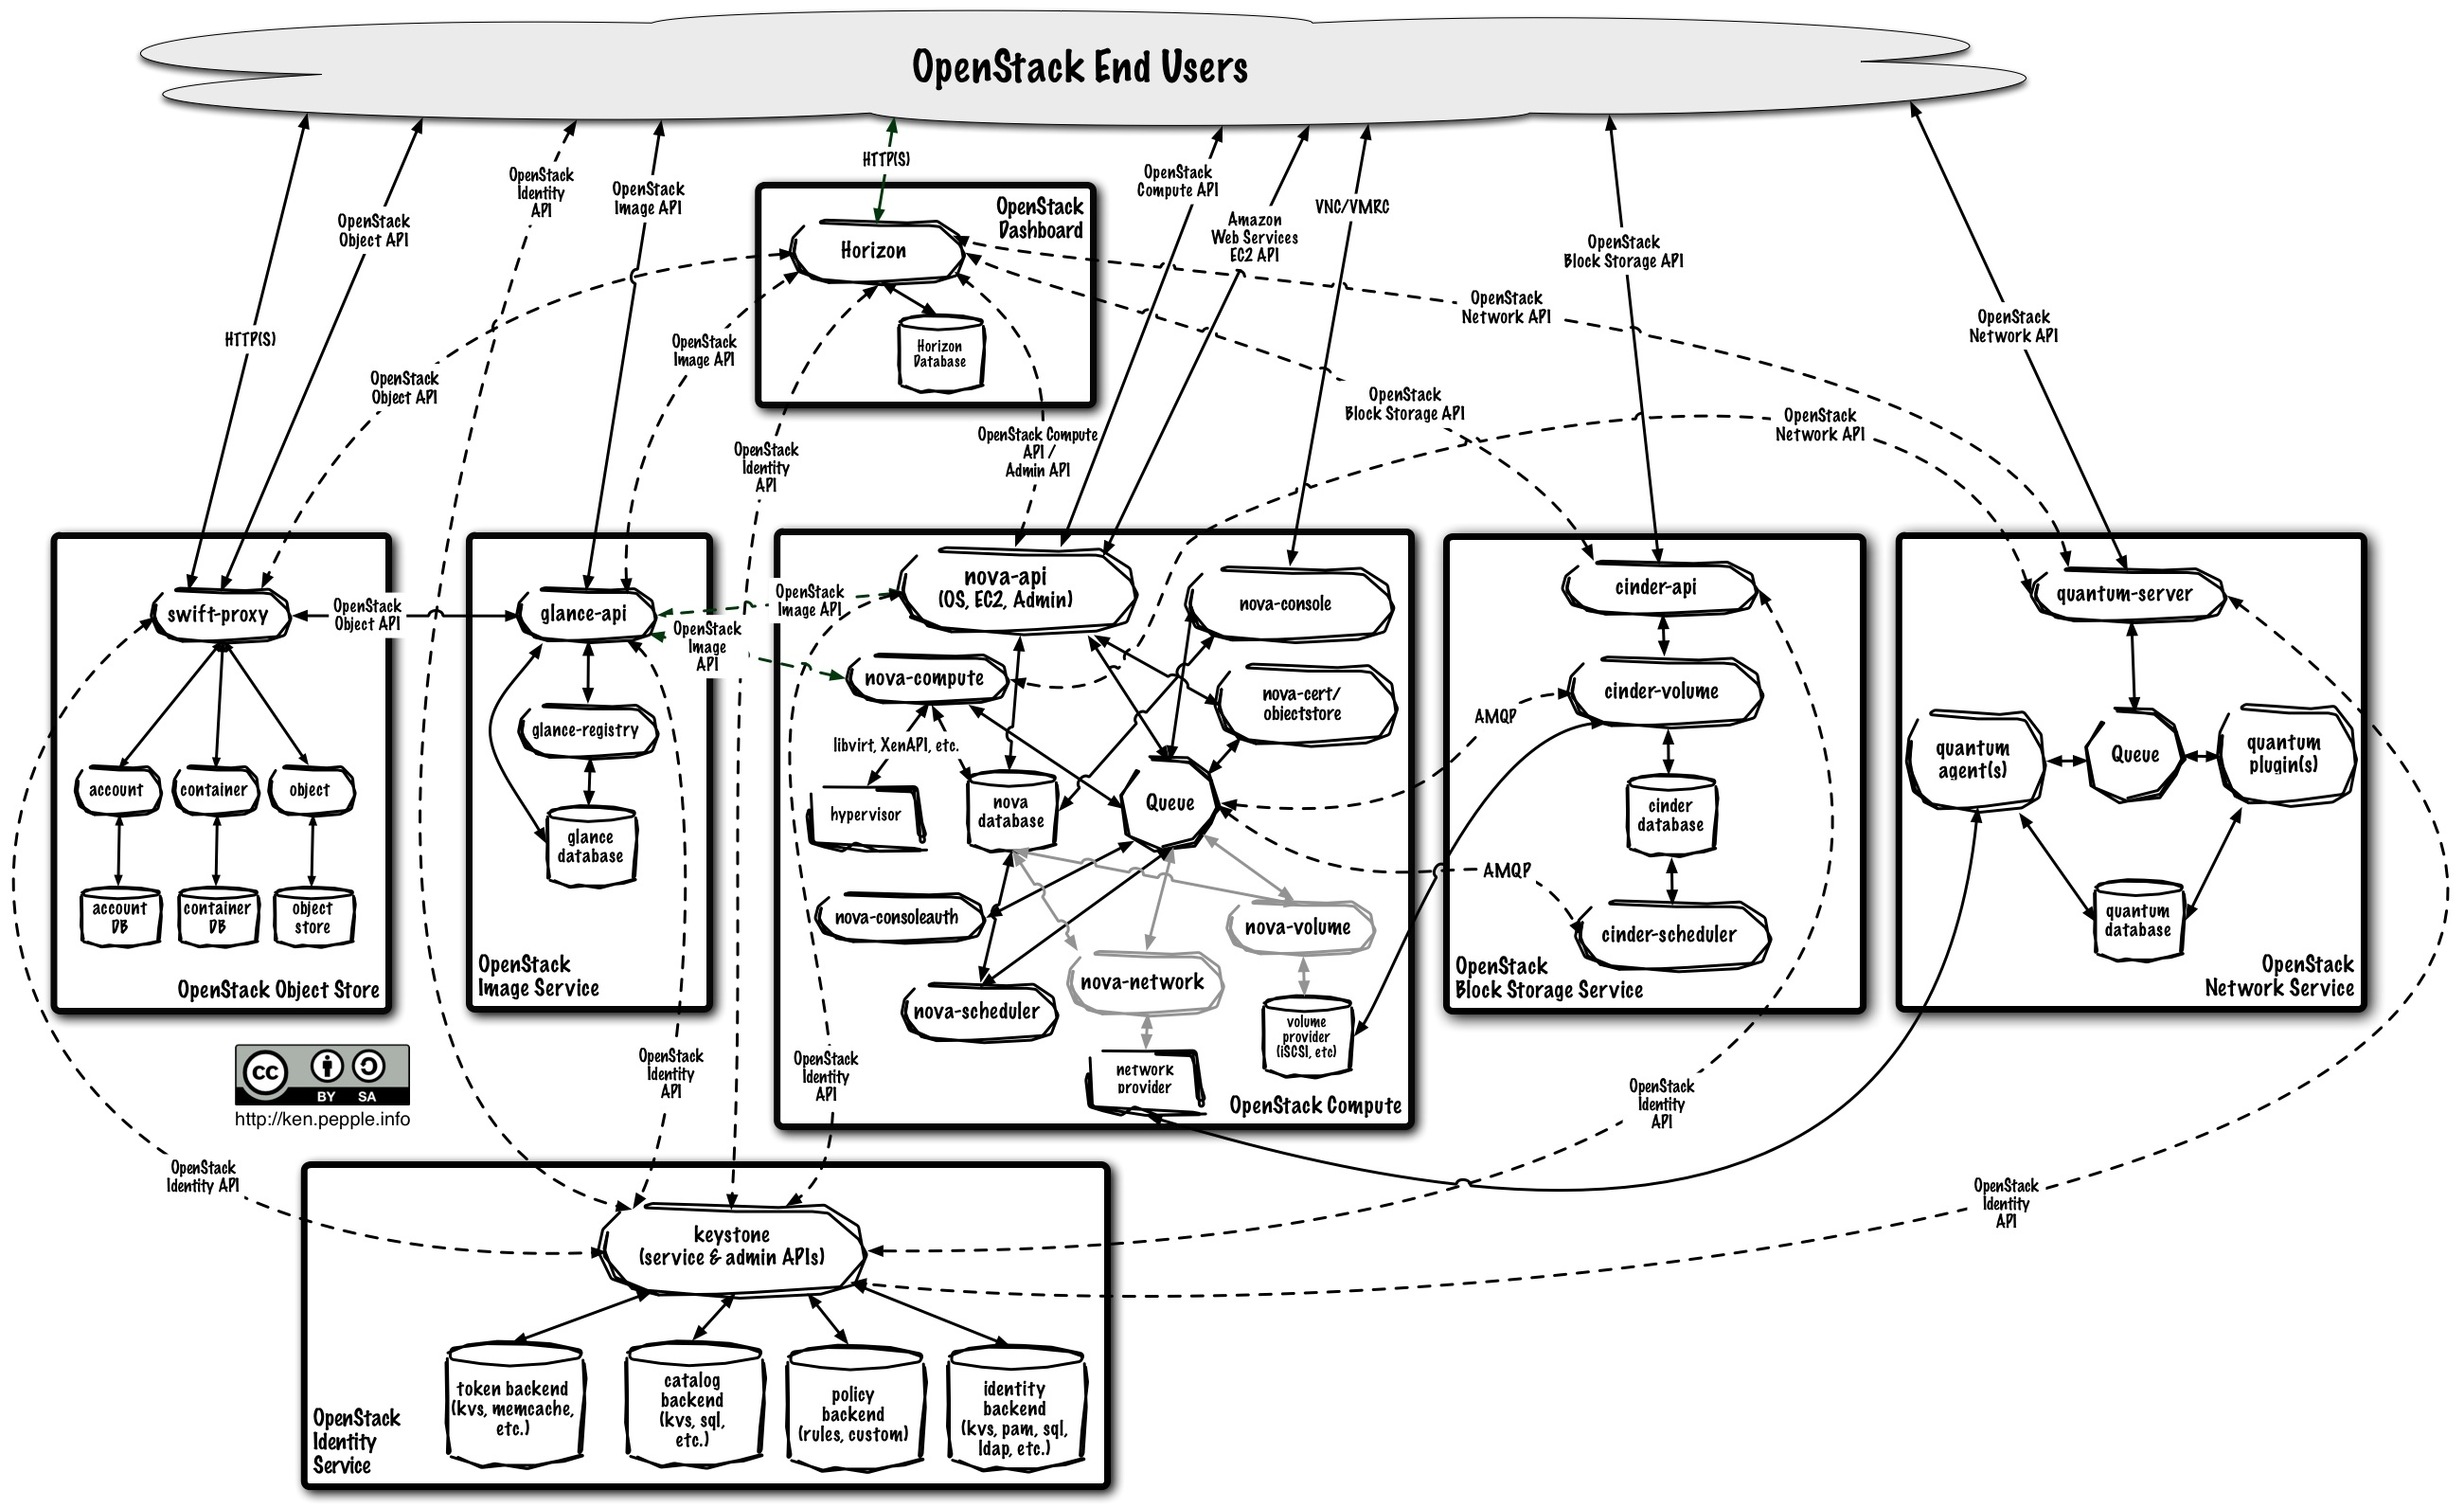 Processing Ci Log Events